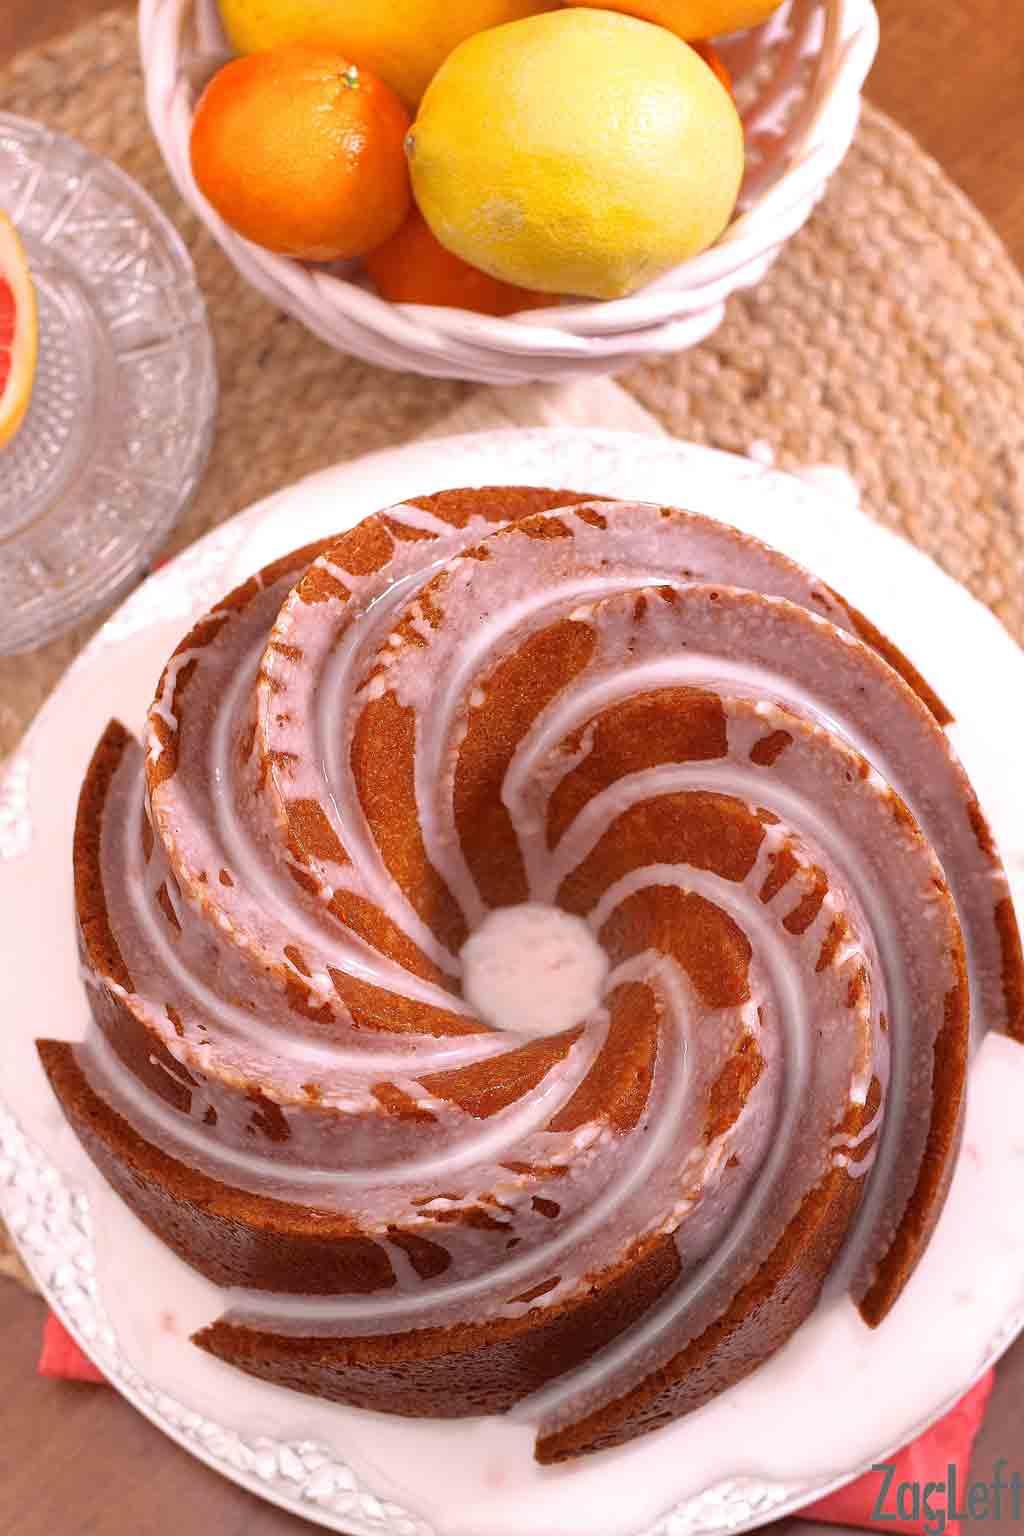 Promo image for Lemon Grapefruit Buttermilk Cake recipe